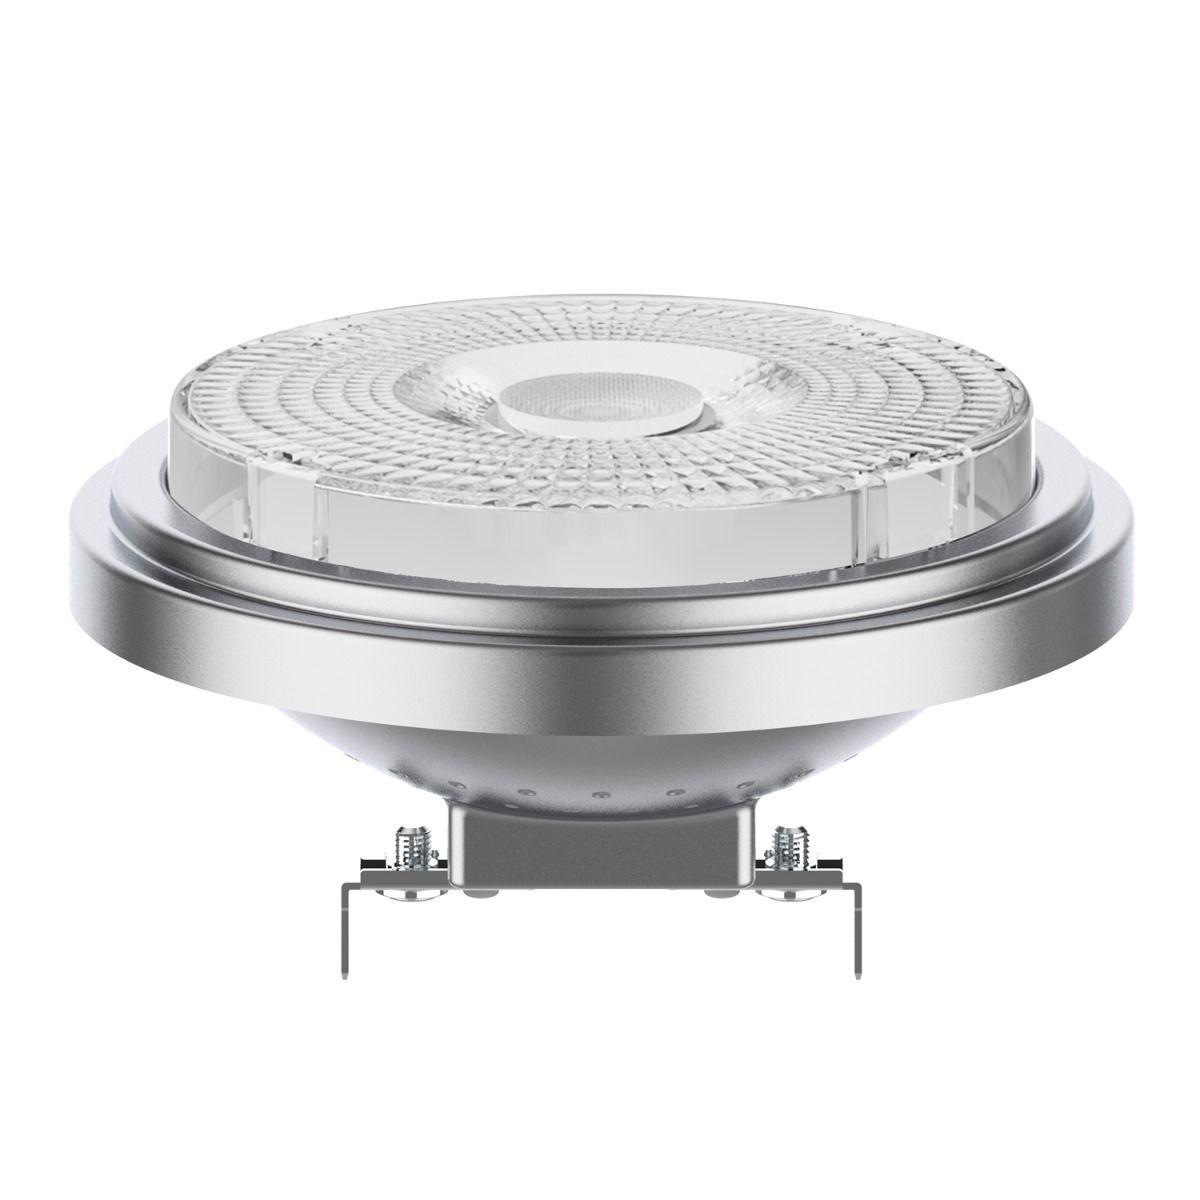 Noxion Lucent LED-Spot AR111 G53 12V 7.3W 927 40D | Dimmbar - Höchste Farbwiedergabe - Ersatz für 50W